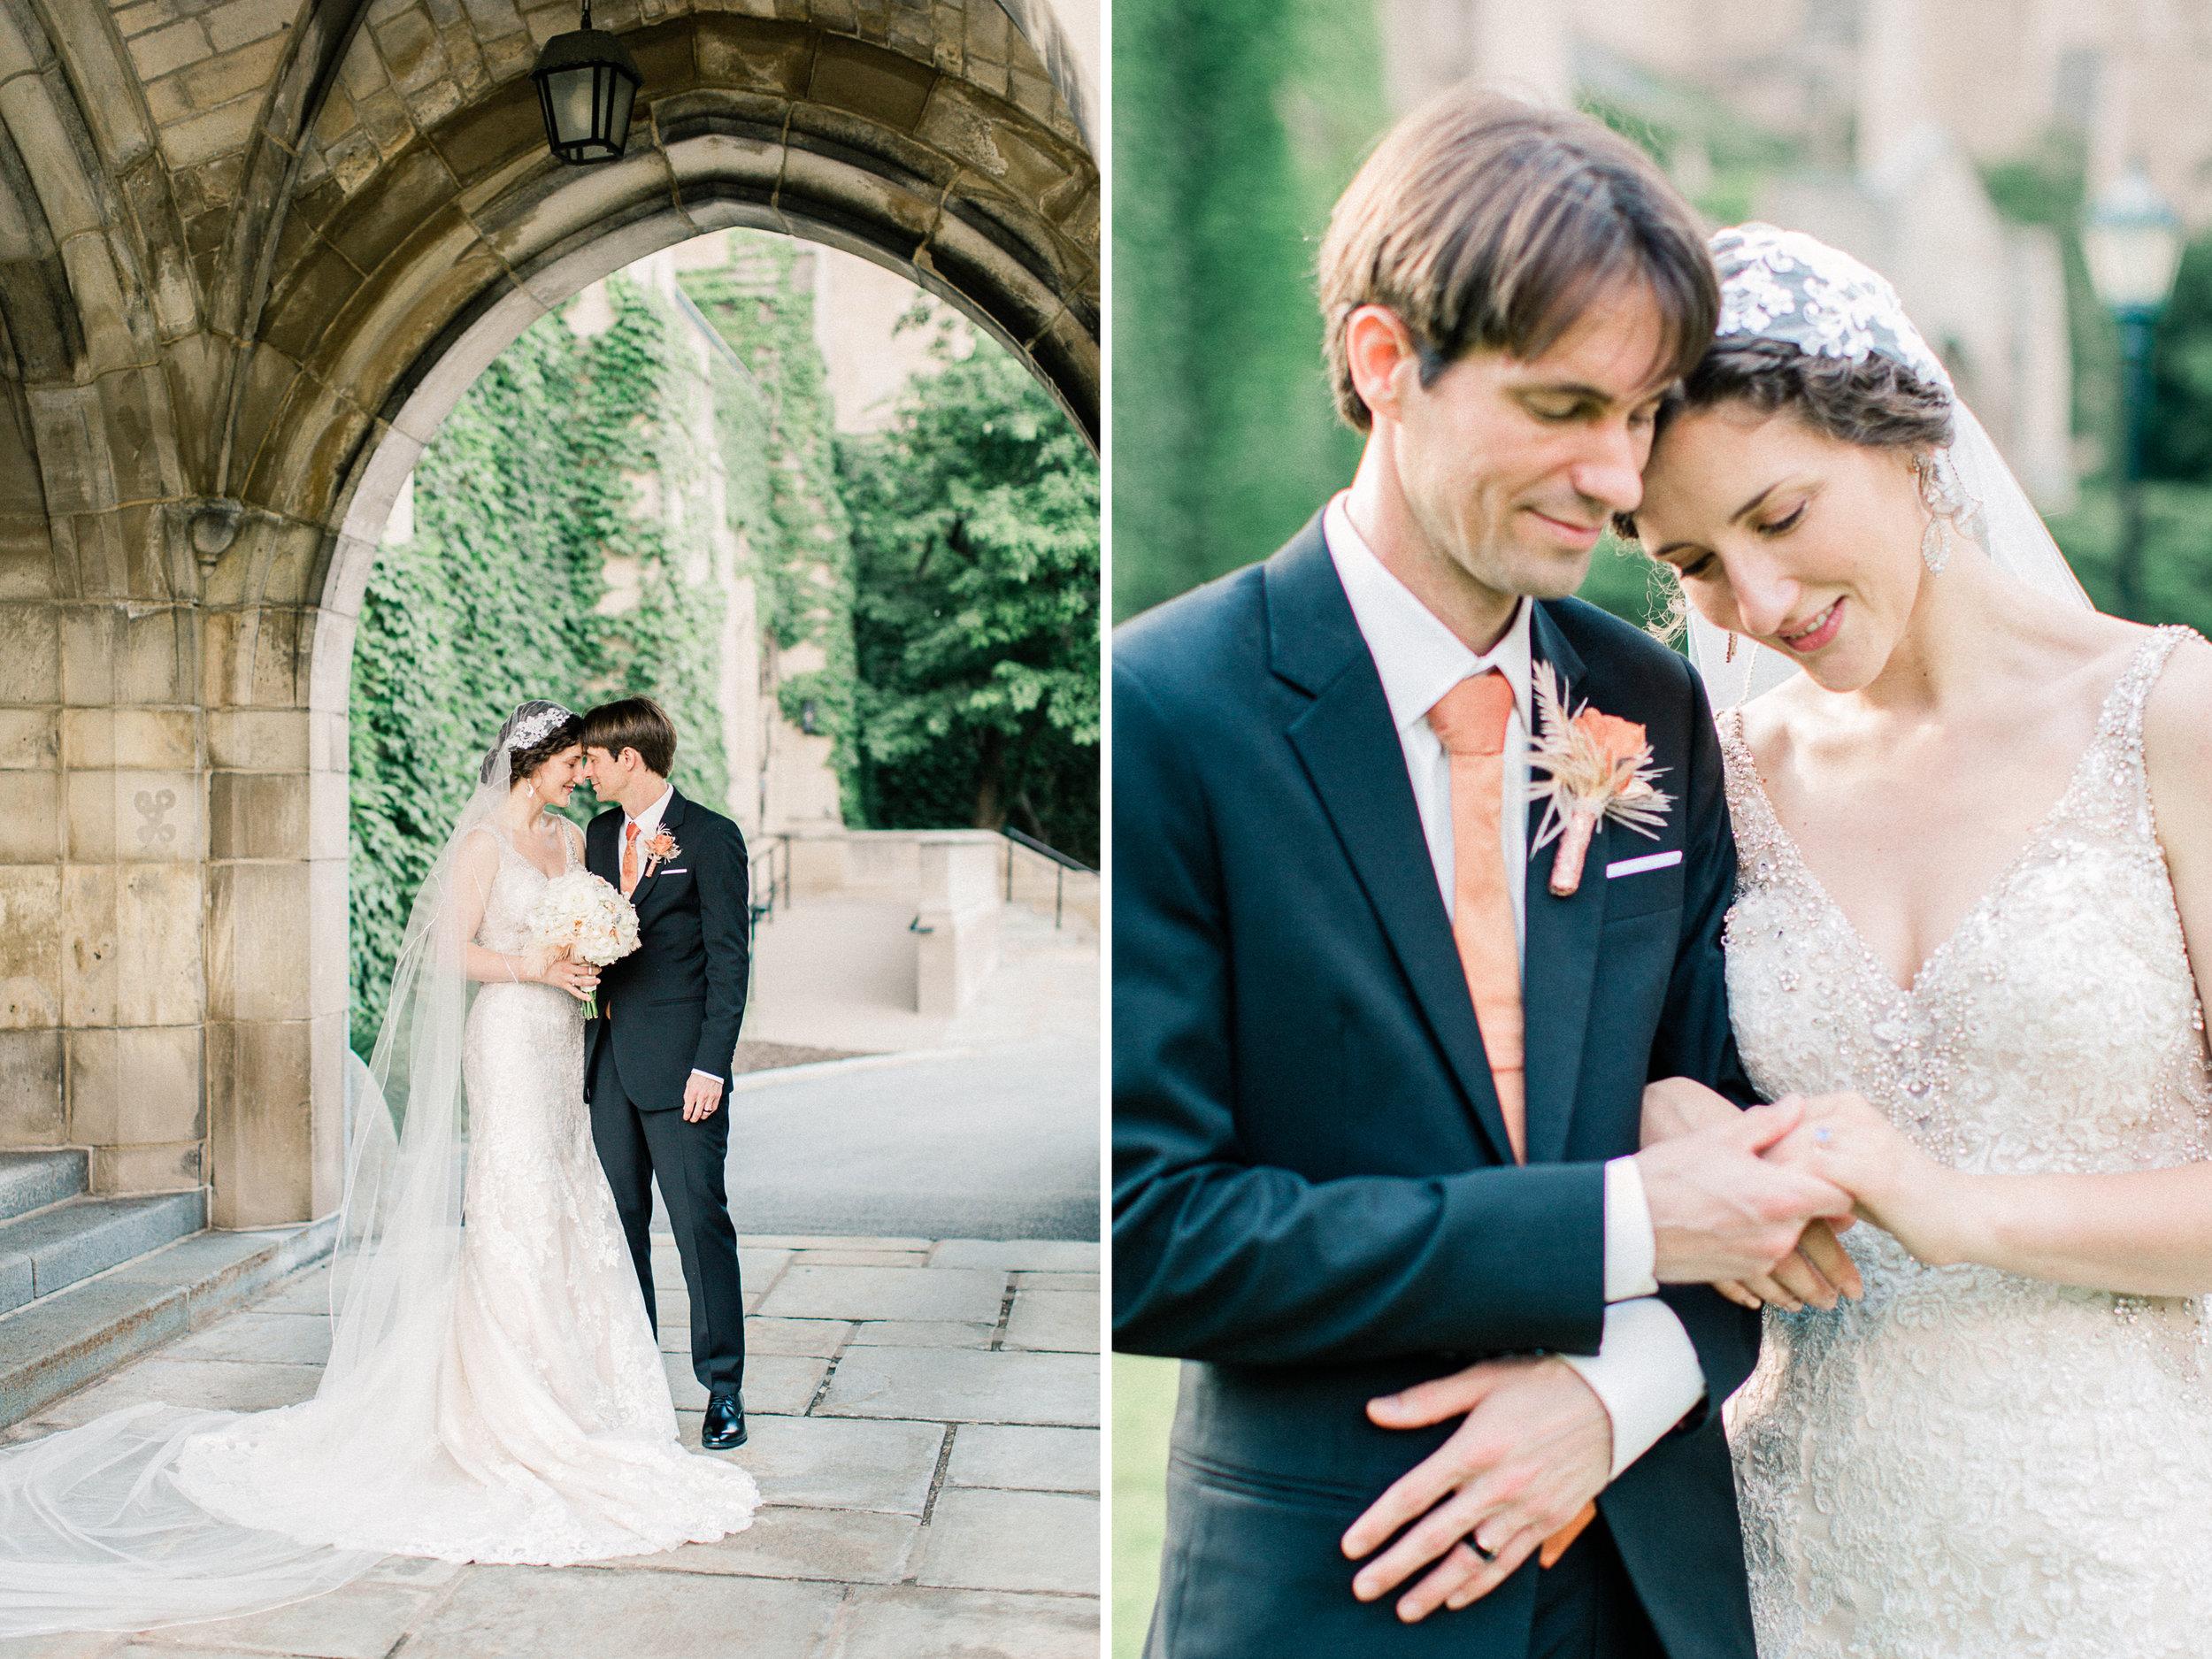 Dorothy_Louise_Photography_University_of_Chicago_Wedding9.jpg